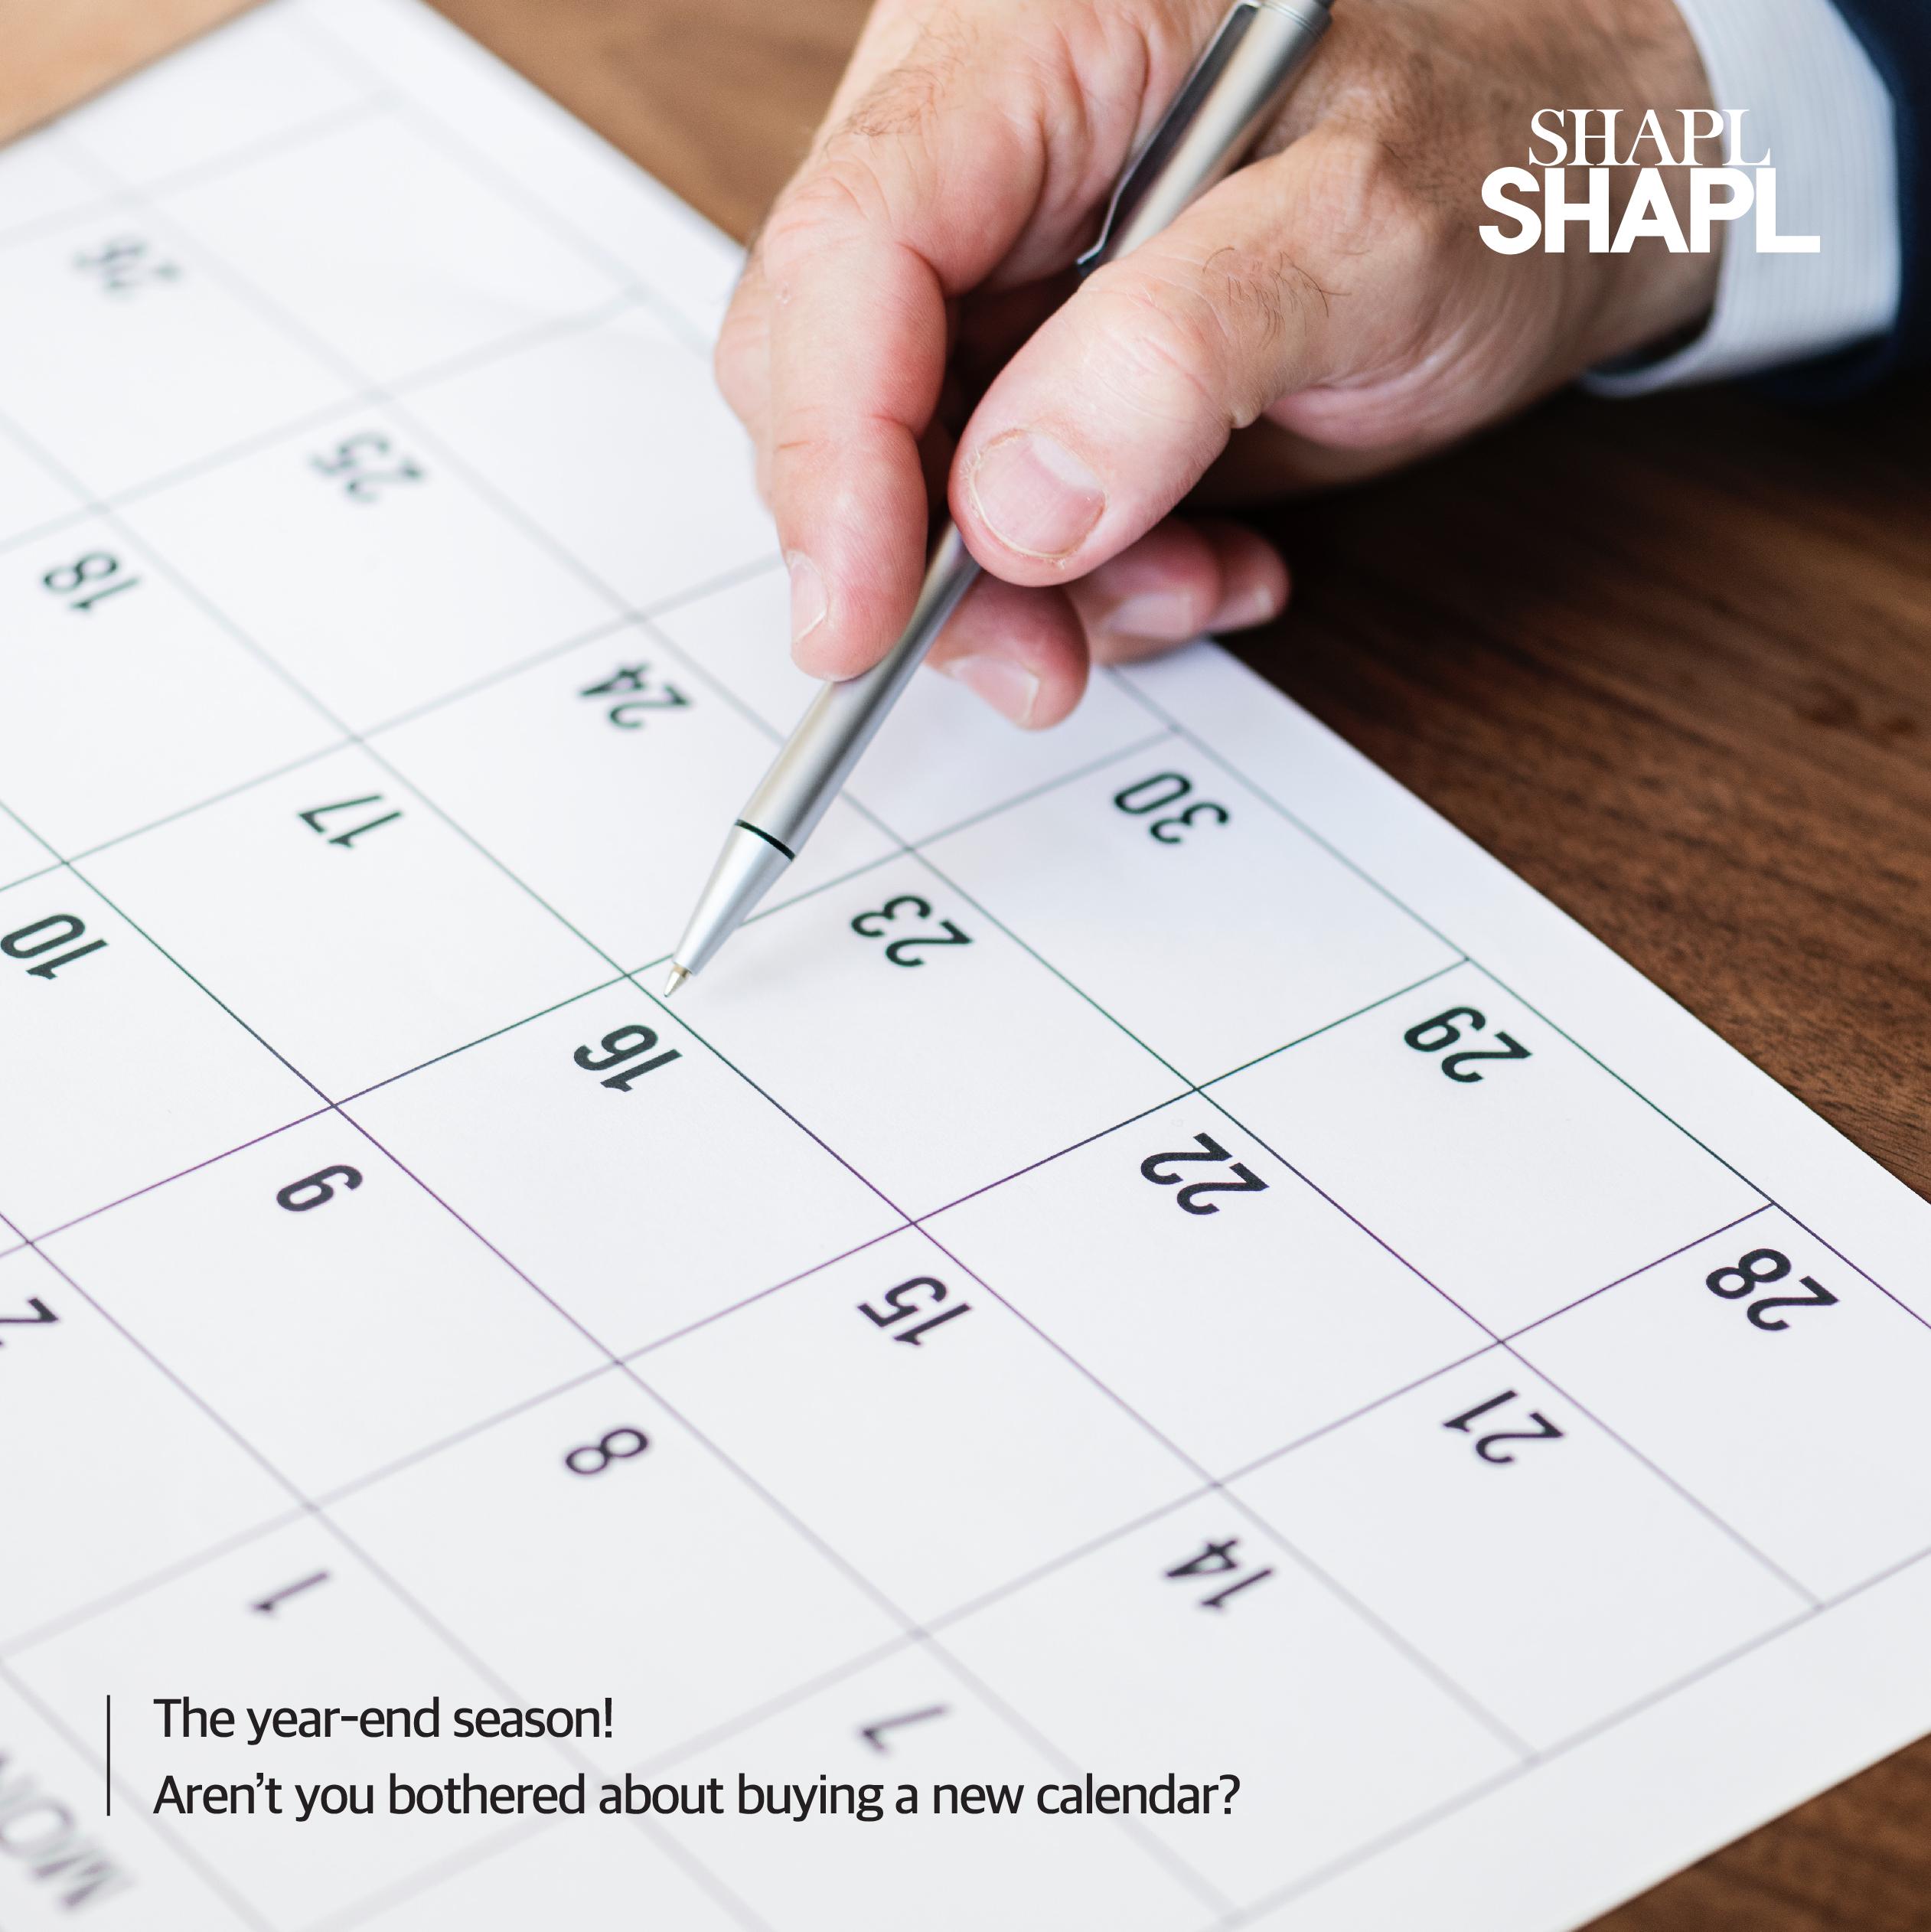 201901/181230_Perpetual_Desk_Calendar_refine_EN_02.jpg